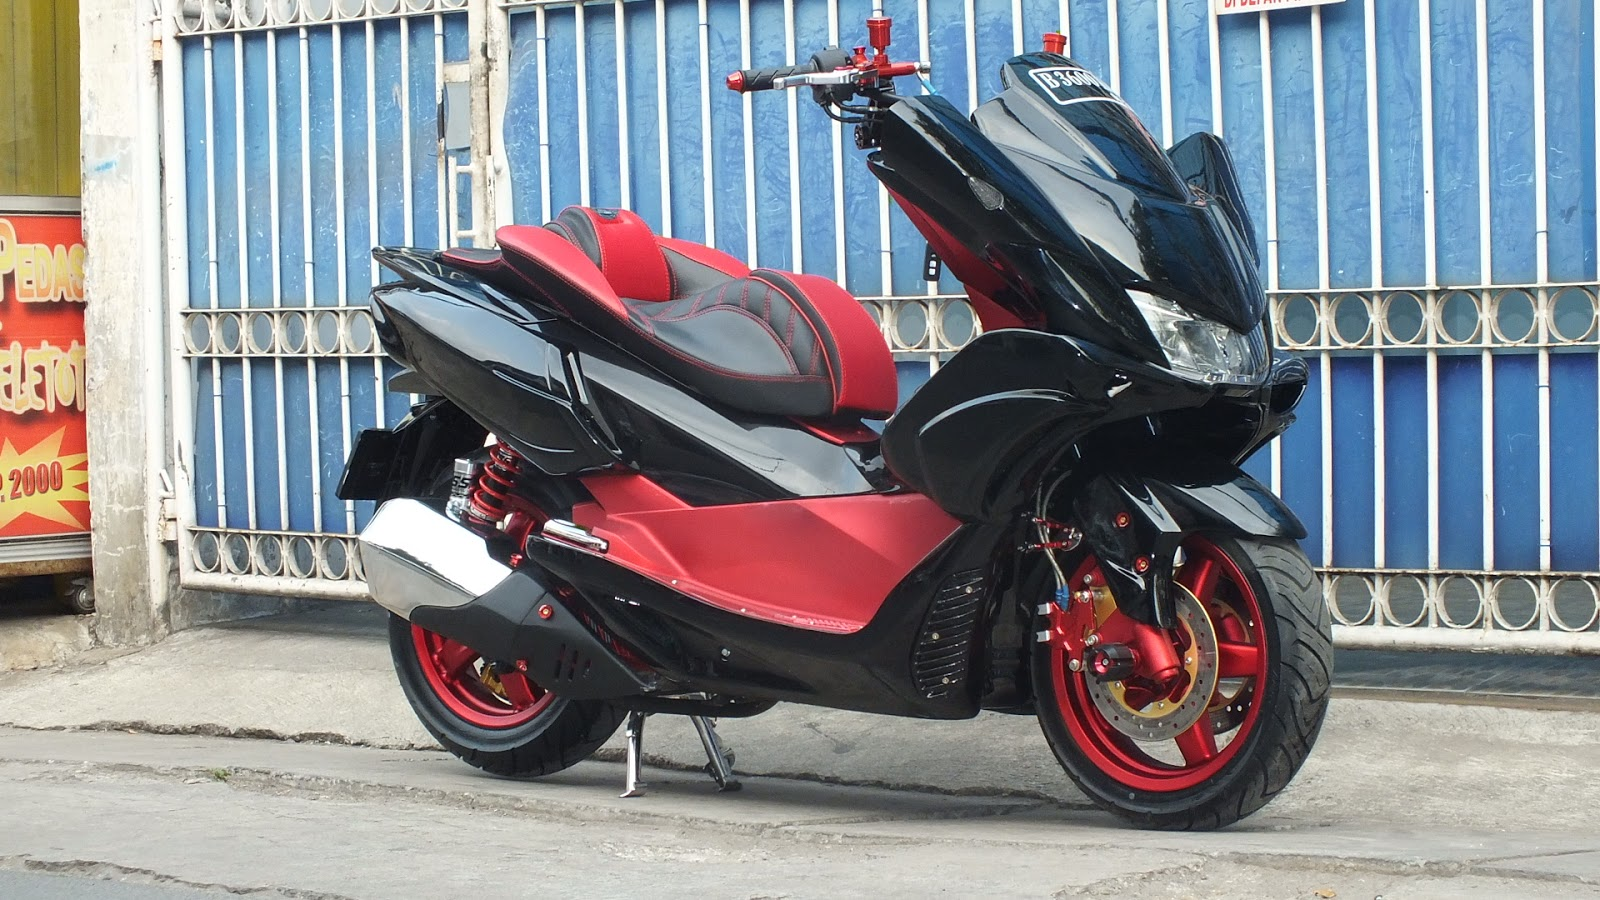 Gambar Modifikasi Jok Honda Pcx 2019 Sobotomotif